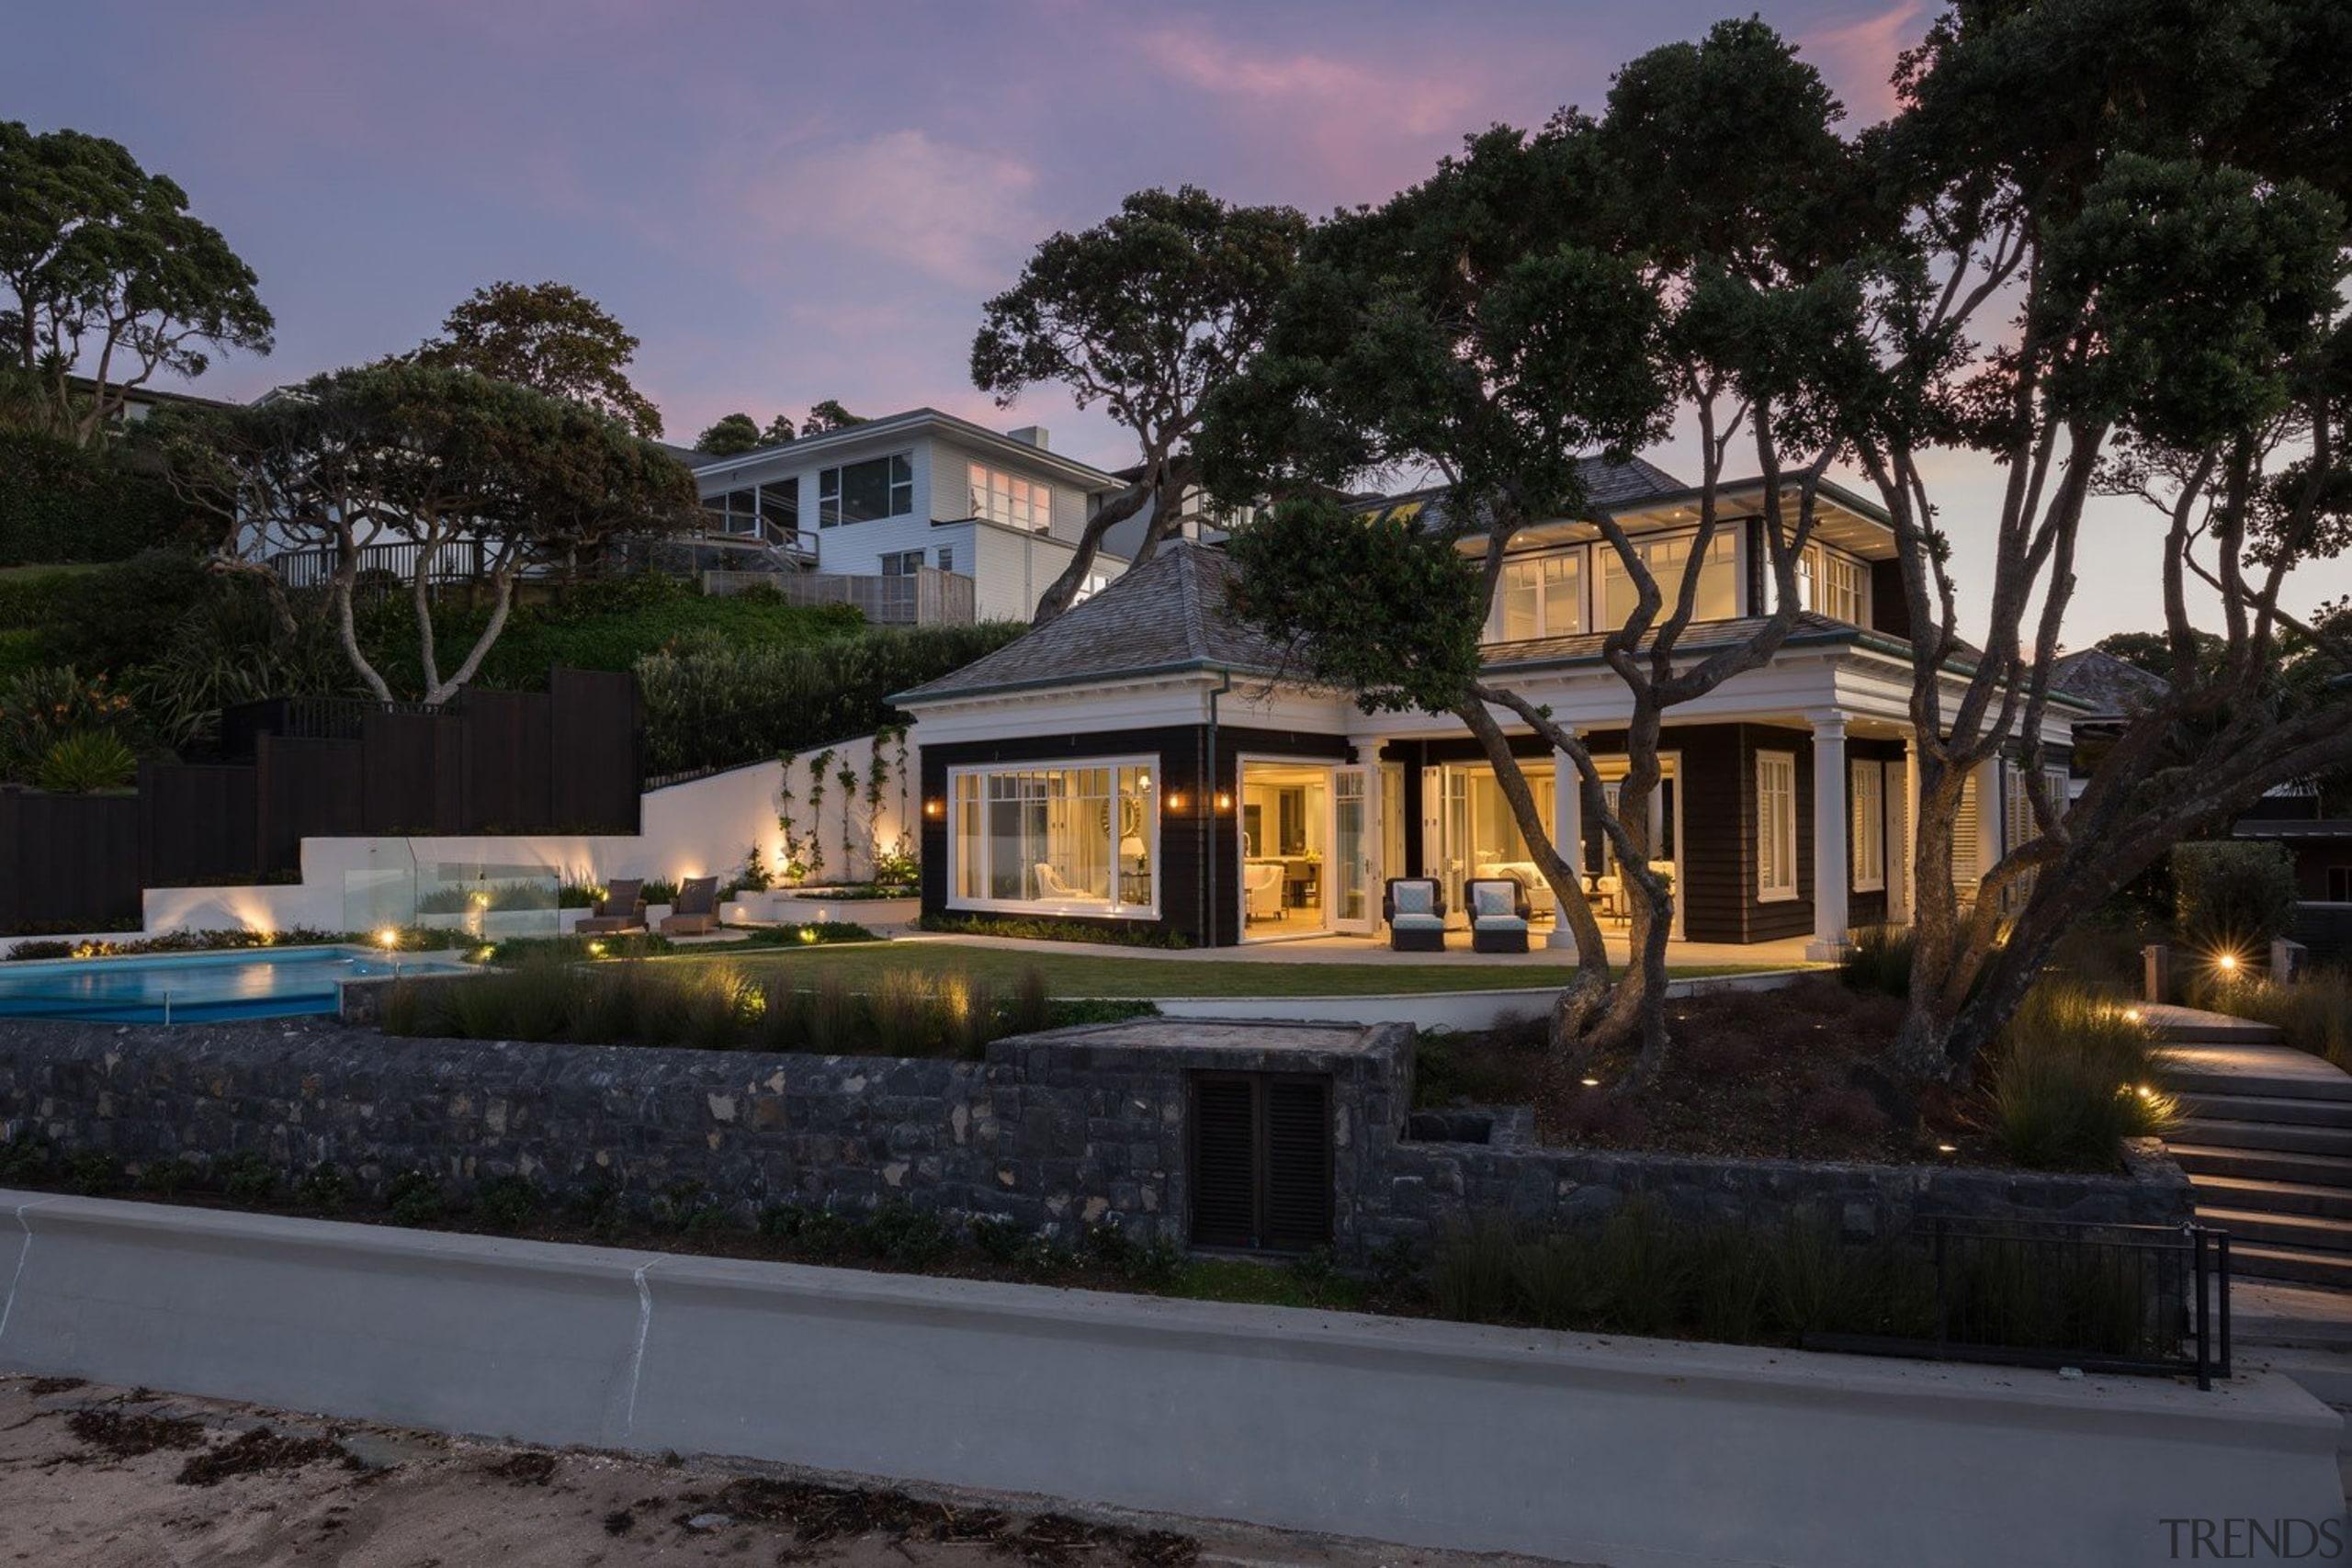 Exterior - architecture | cottage | estate | architecture, cottage, estate, facade, home, house, mansion, property, real estate, residential area, resort, villa, black, gray